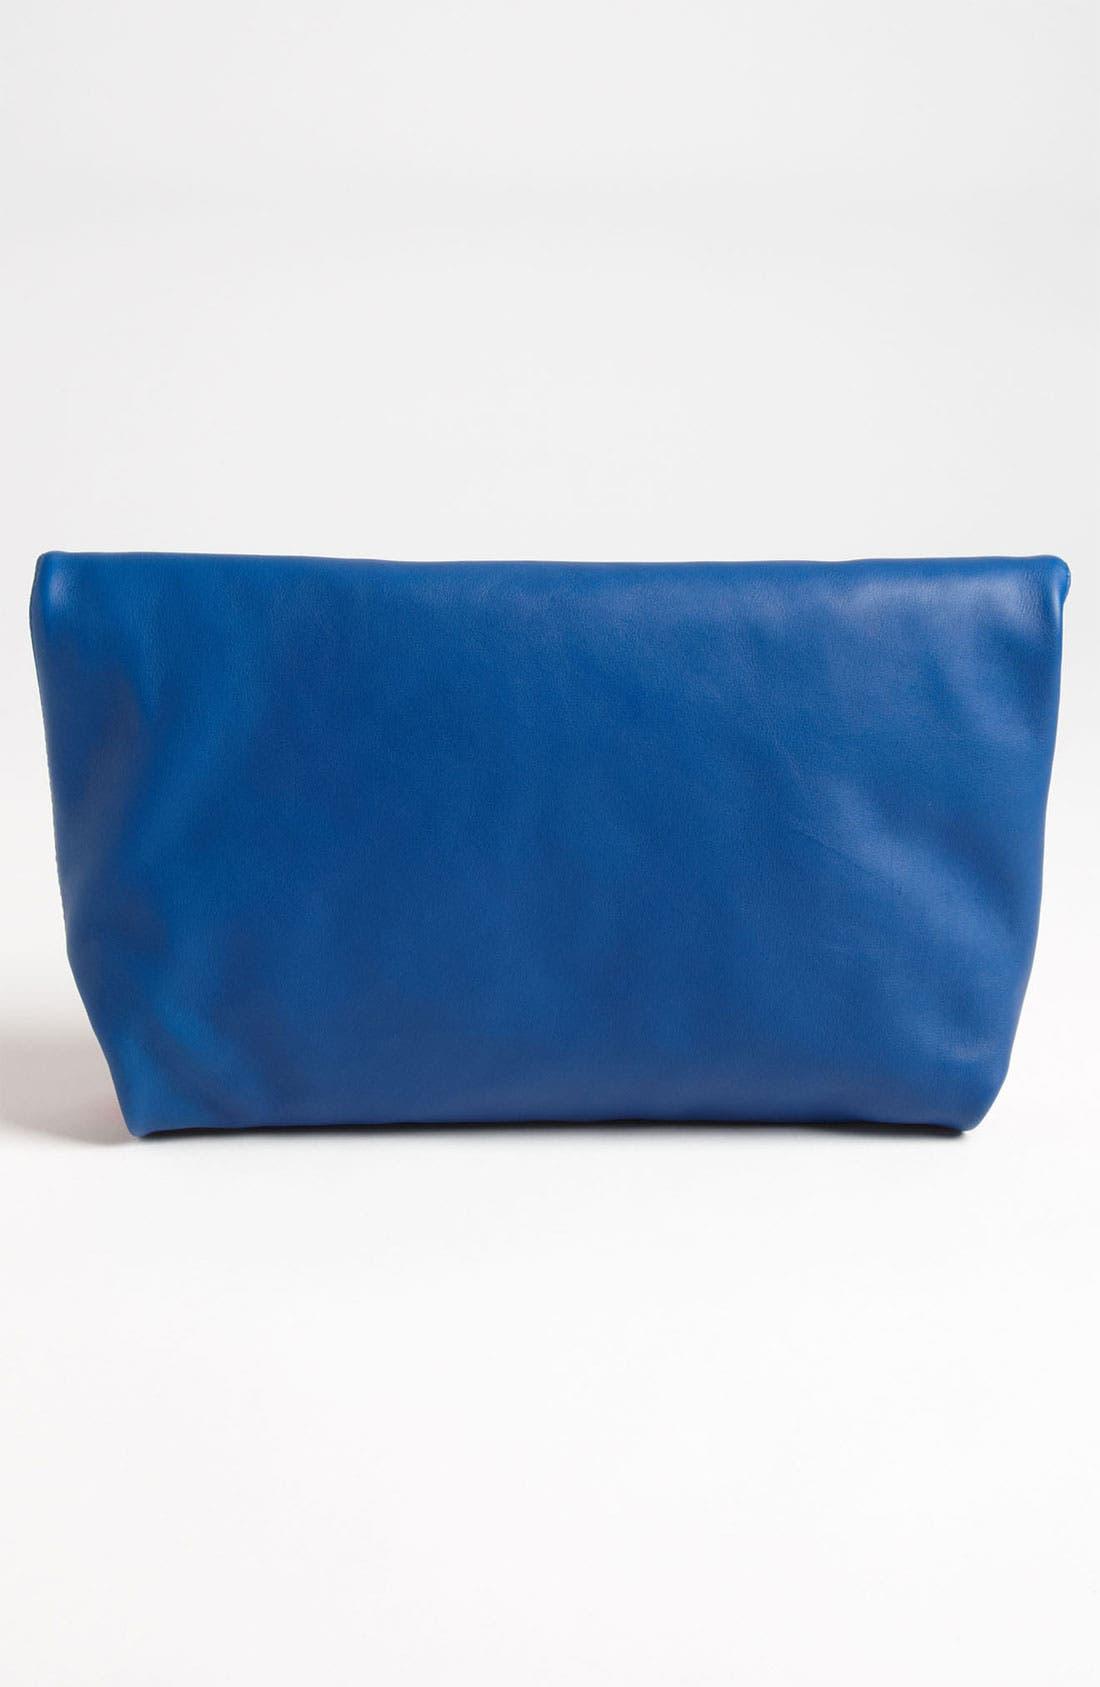 Alternate Image 4  - Emilio Pucci 'Softy - Bicolor' Foldover Clutch